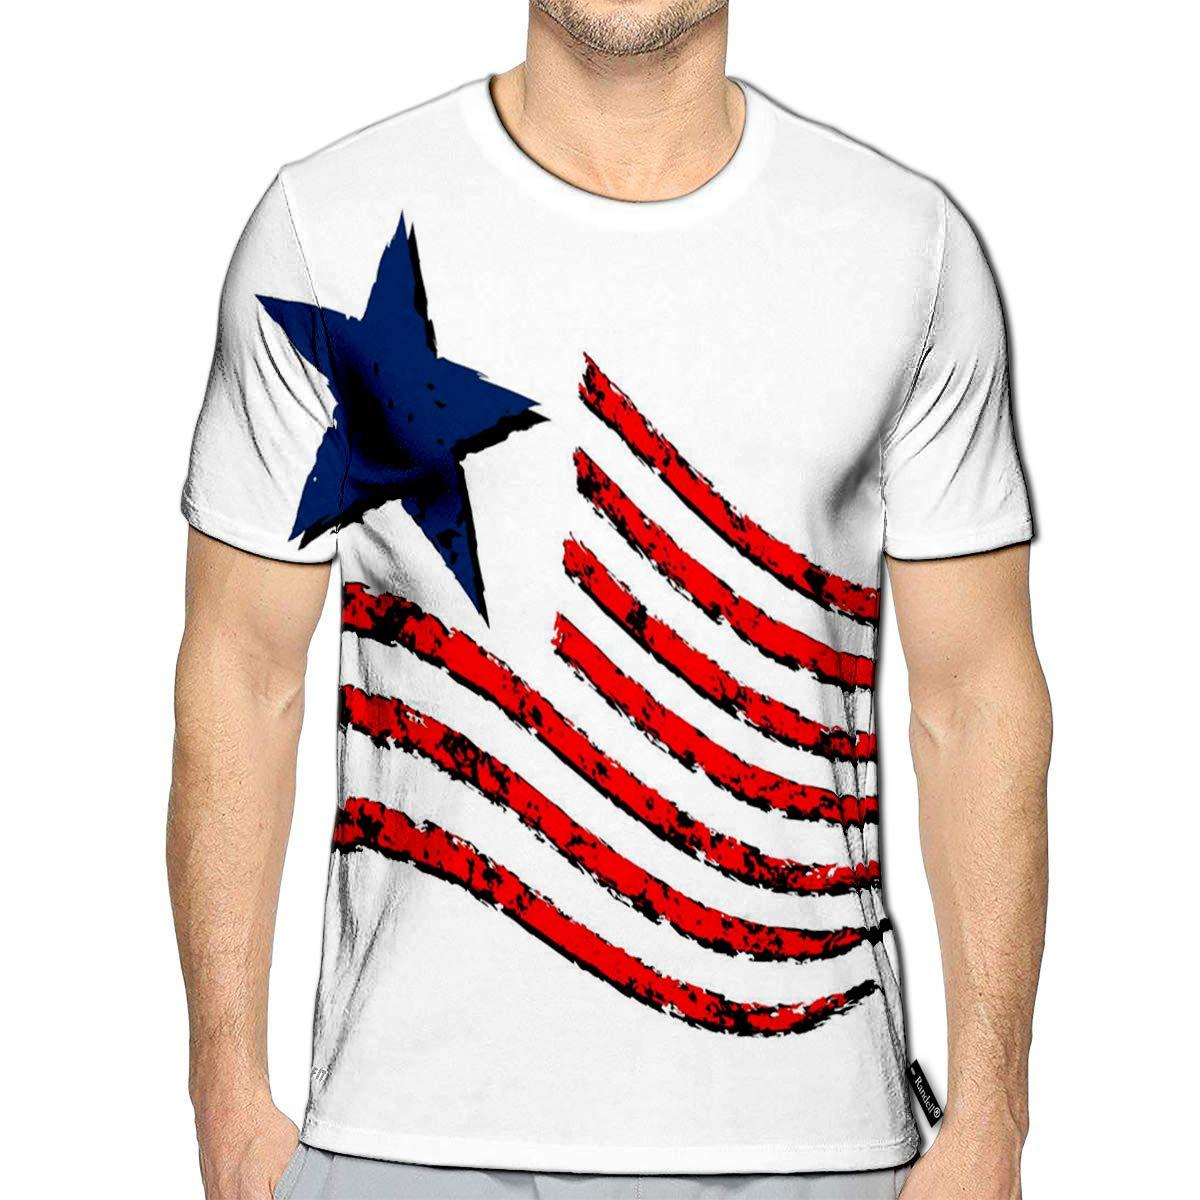 Randell 3D Printed T-Shirts Donuts Short Sleeve Tops Tees